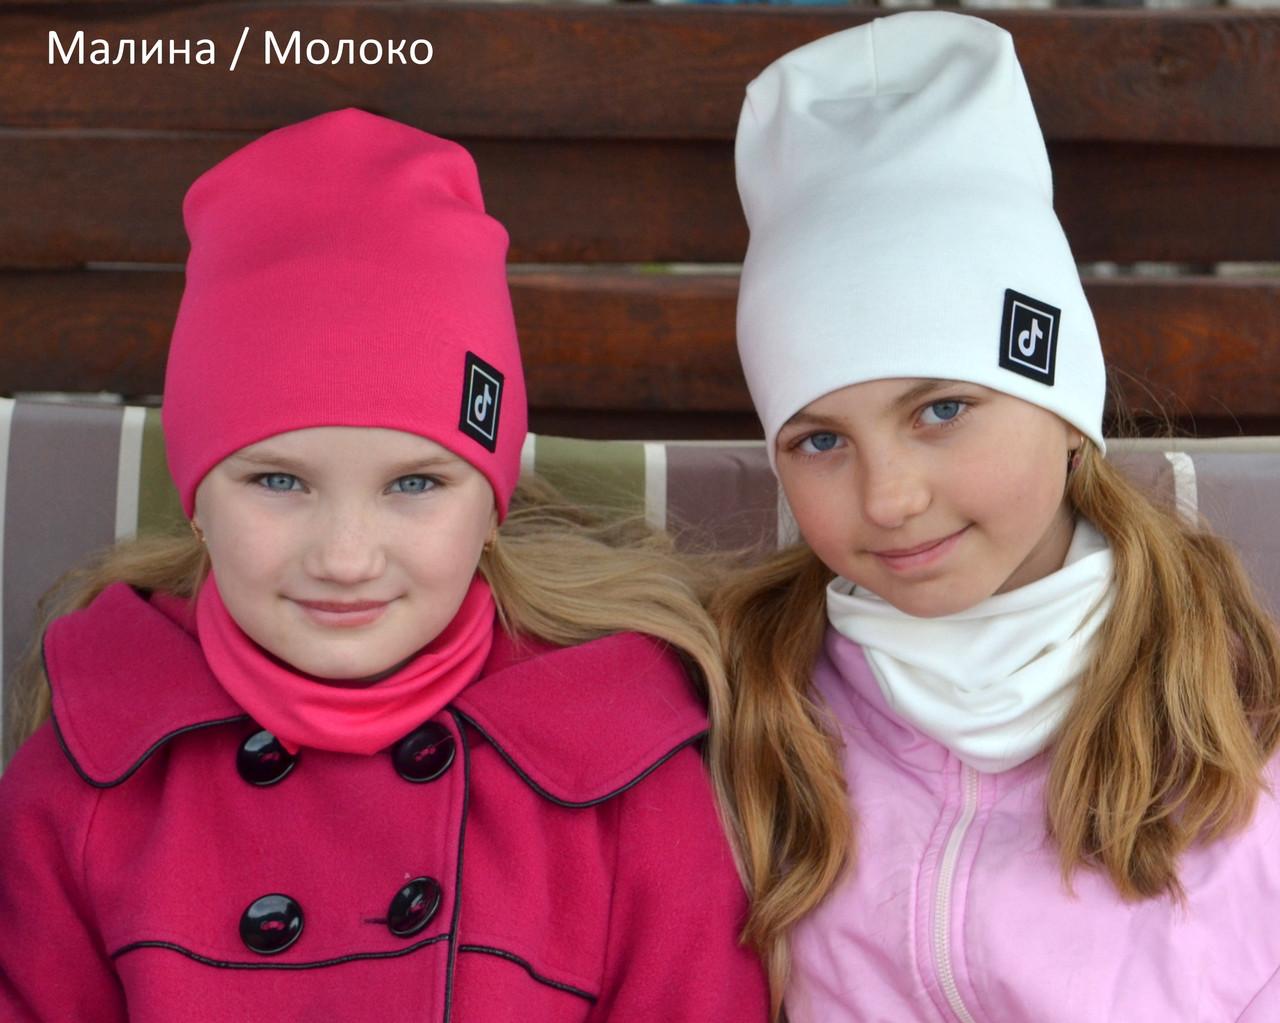 №178 Новинка Тик ток! Трикотаж шапка+хомут.р.54-57 для детей от 7 лет/подросток.В наличии